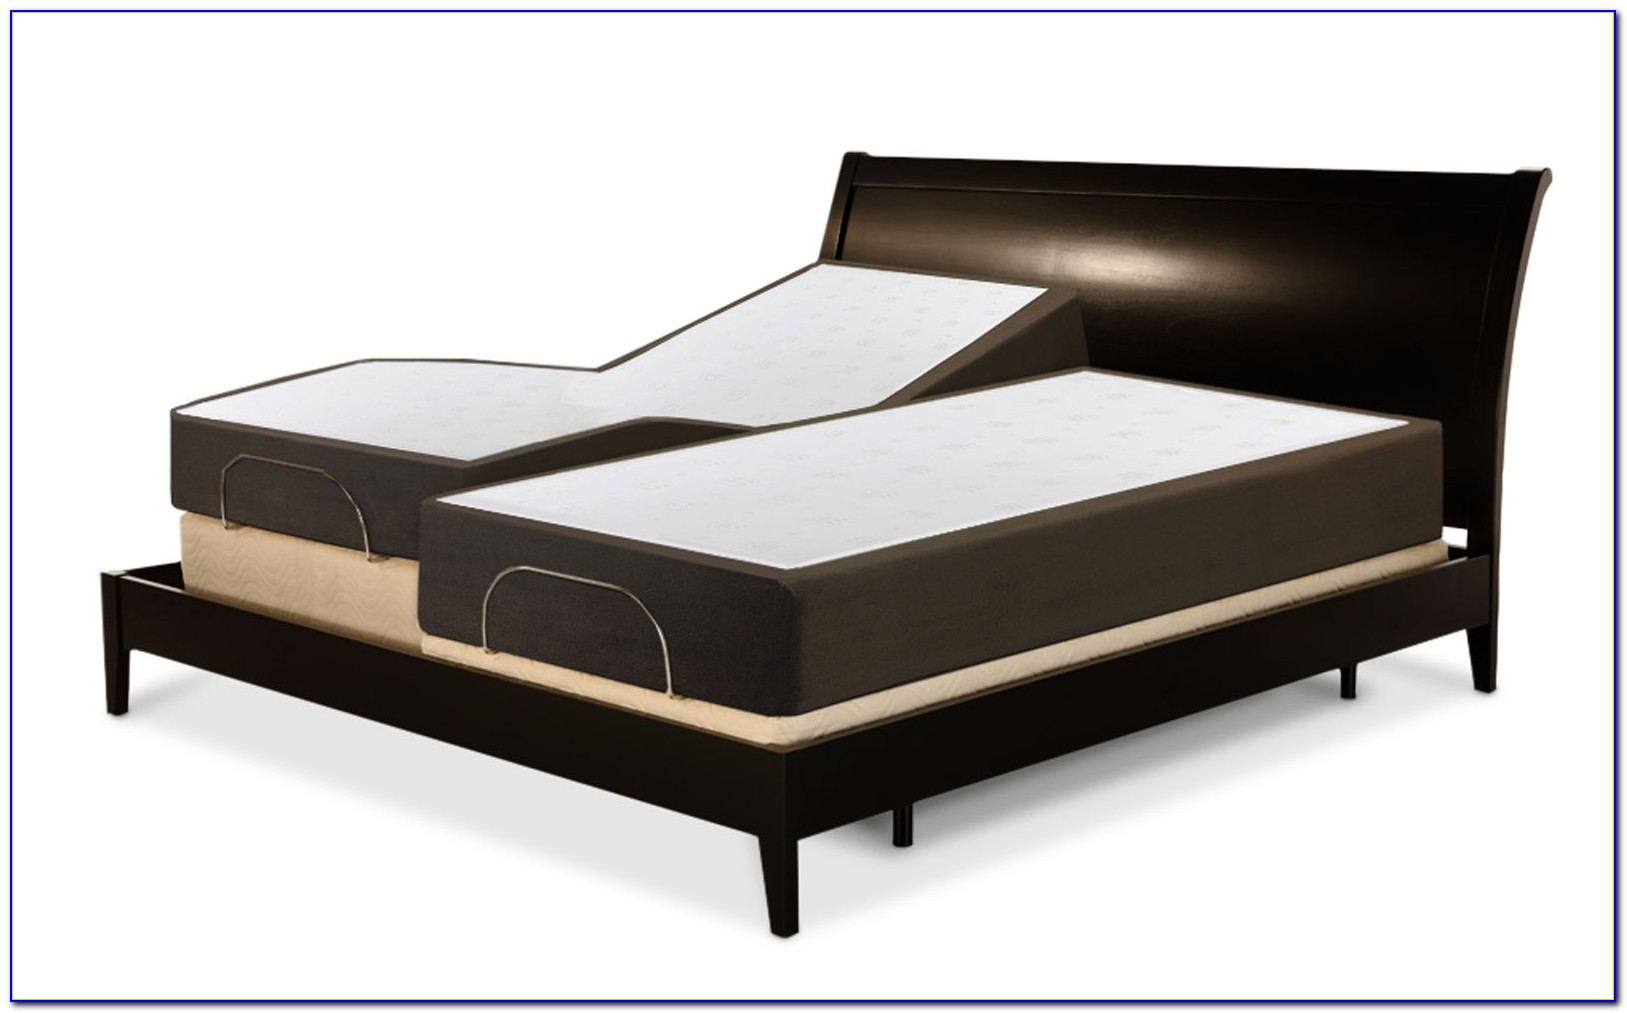 Split King Adjustable Bed And Mattress